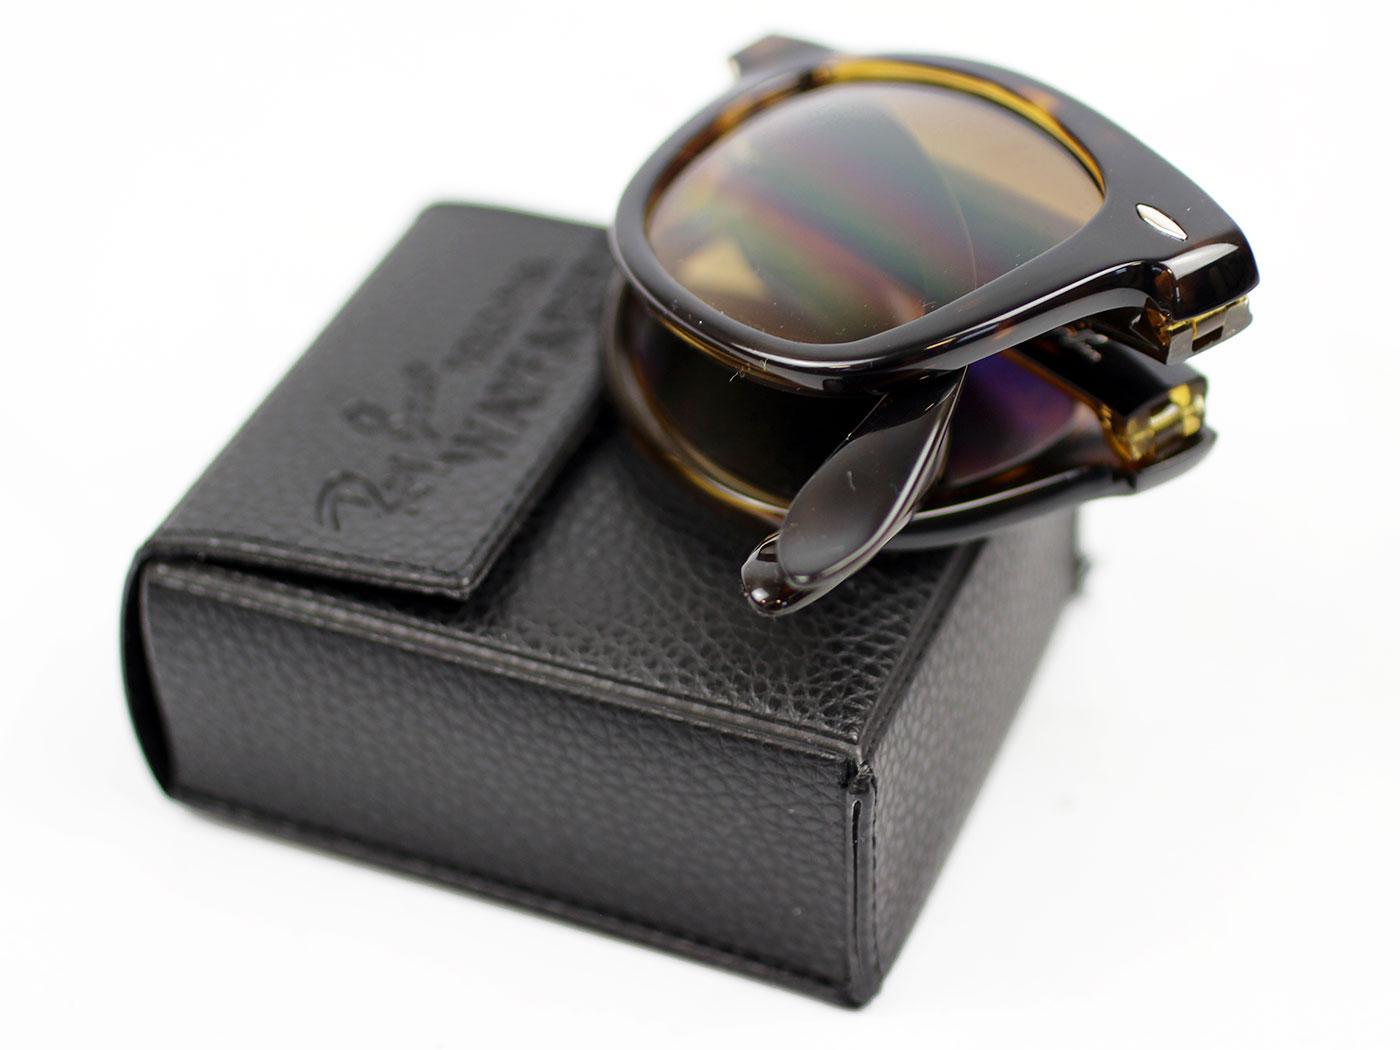 ray ban folding wayfarer sunglasses lite tort  ray ban folding wayfarers retro mod sunglasses (t)